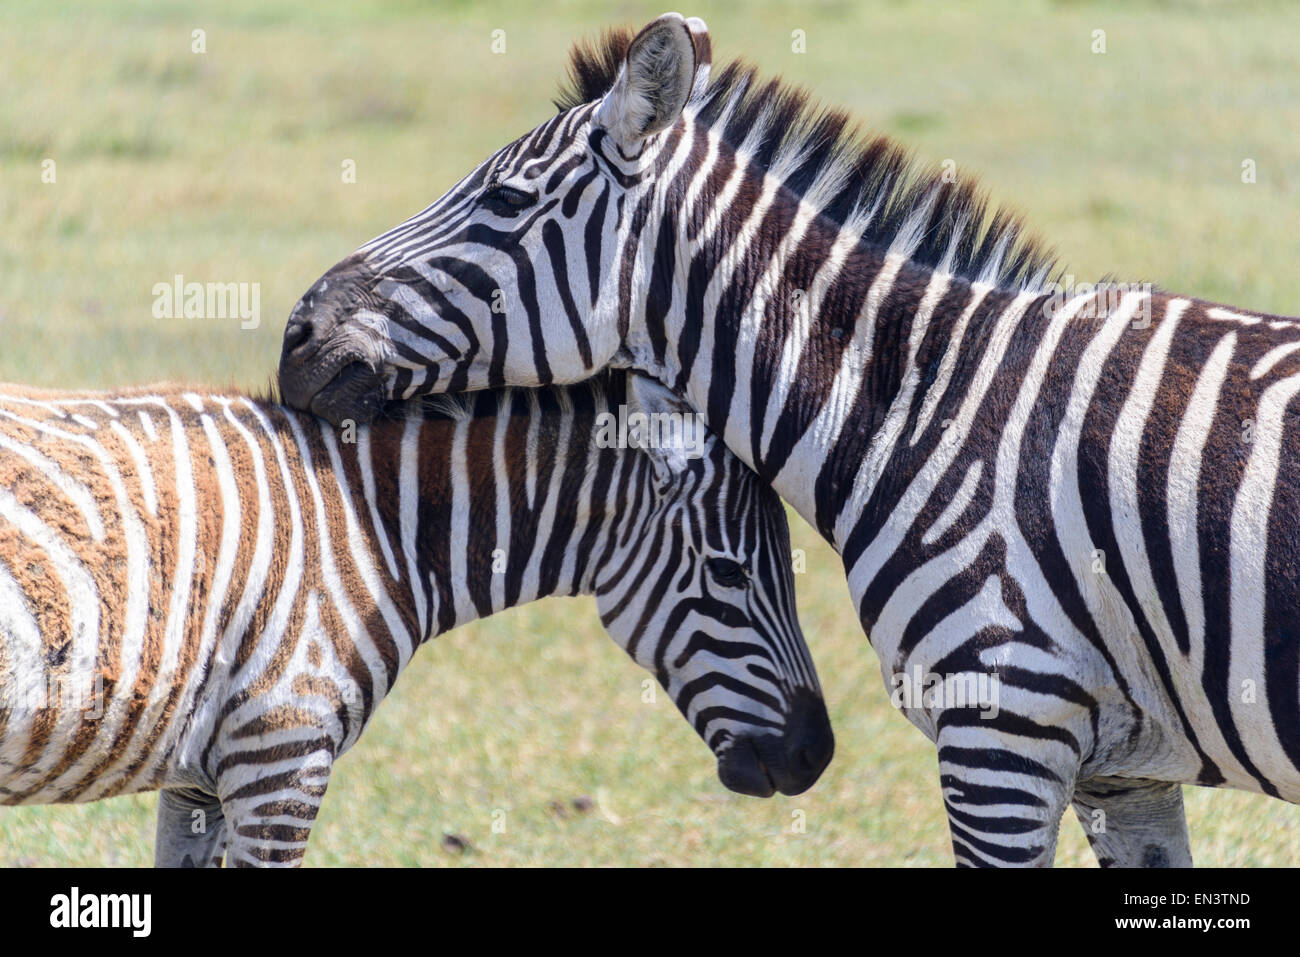 Equus quagga Zebra famille dans la Ngorongoro Conservation Area, Tanzania, Africa. Photo Stock